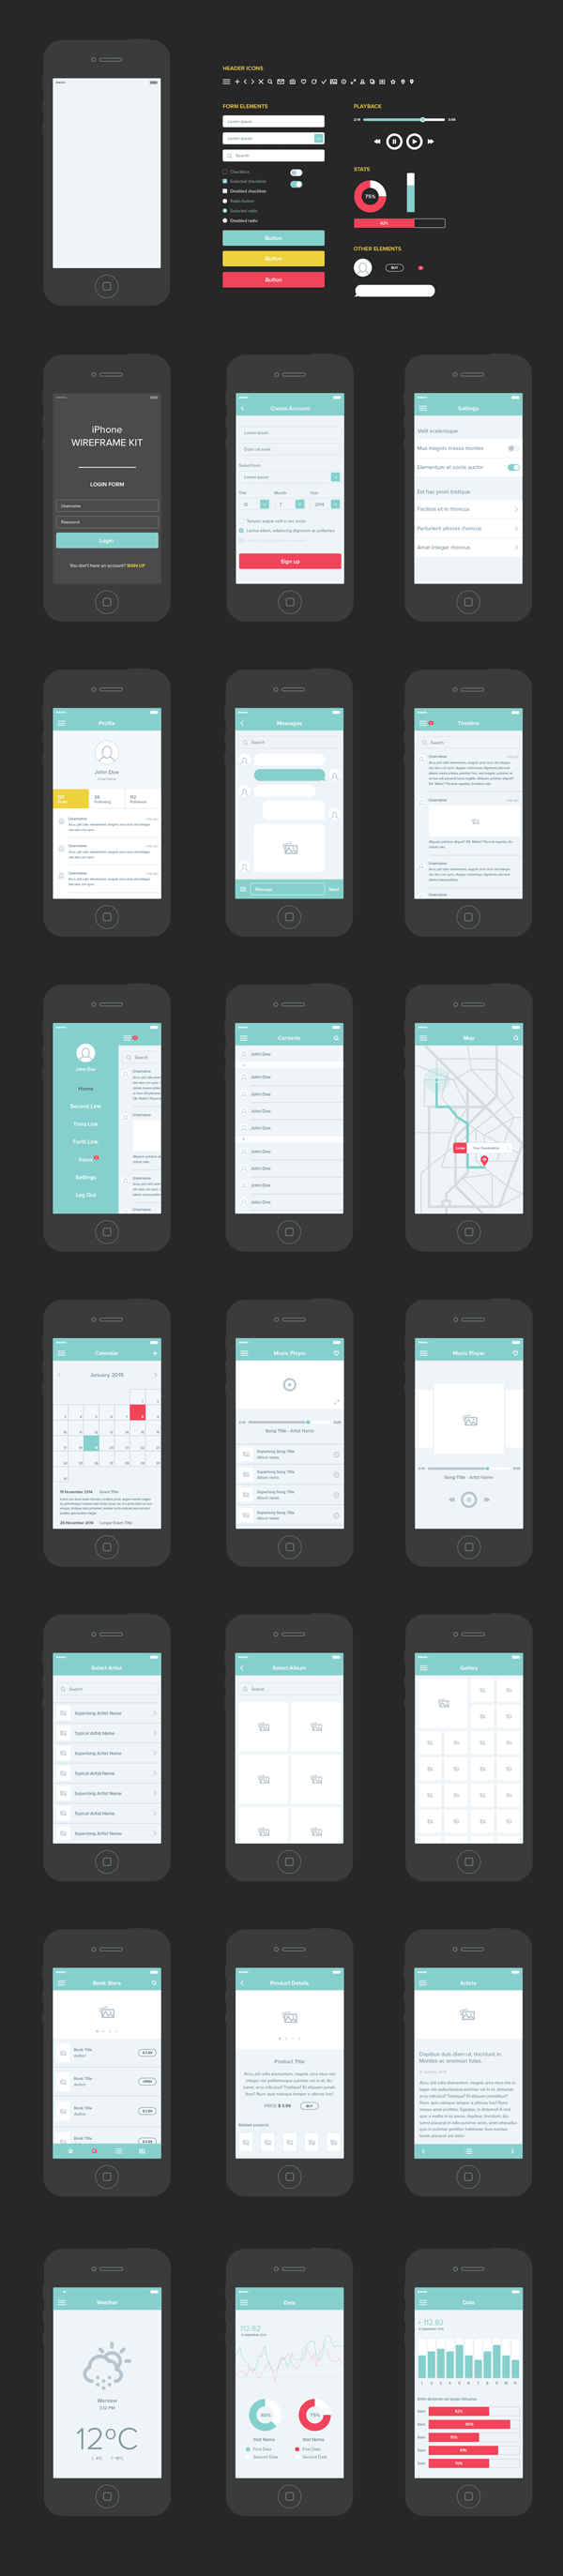 Wireframe iPhone Kit (.Ai) скачать бесплатно